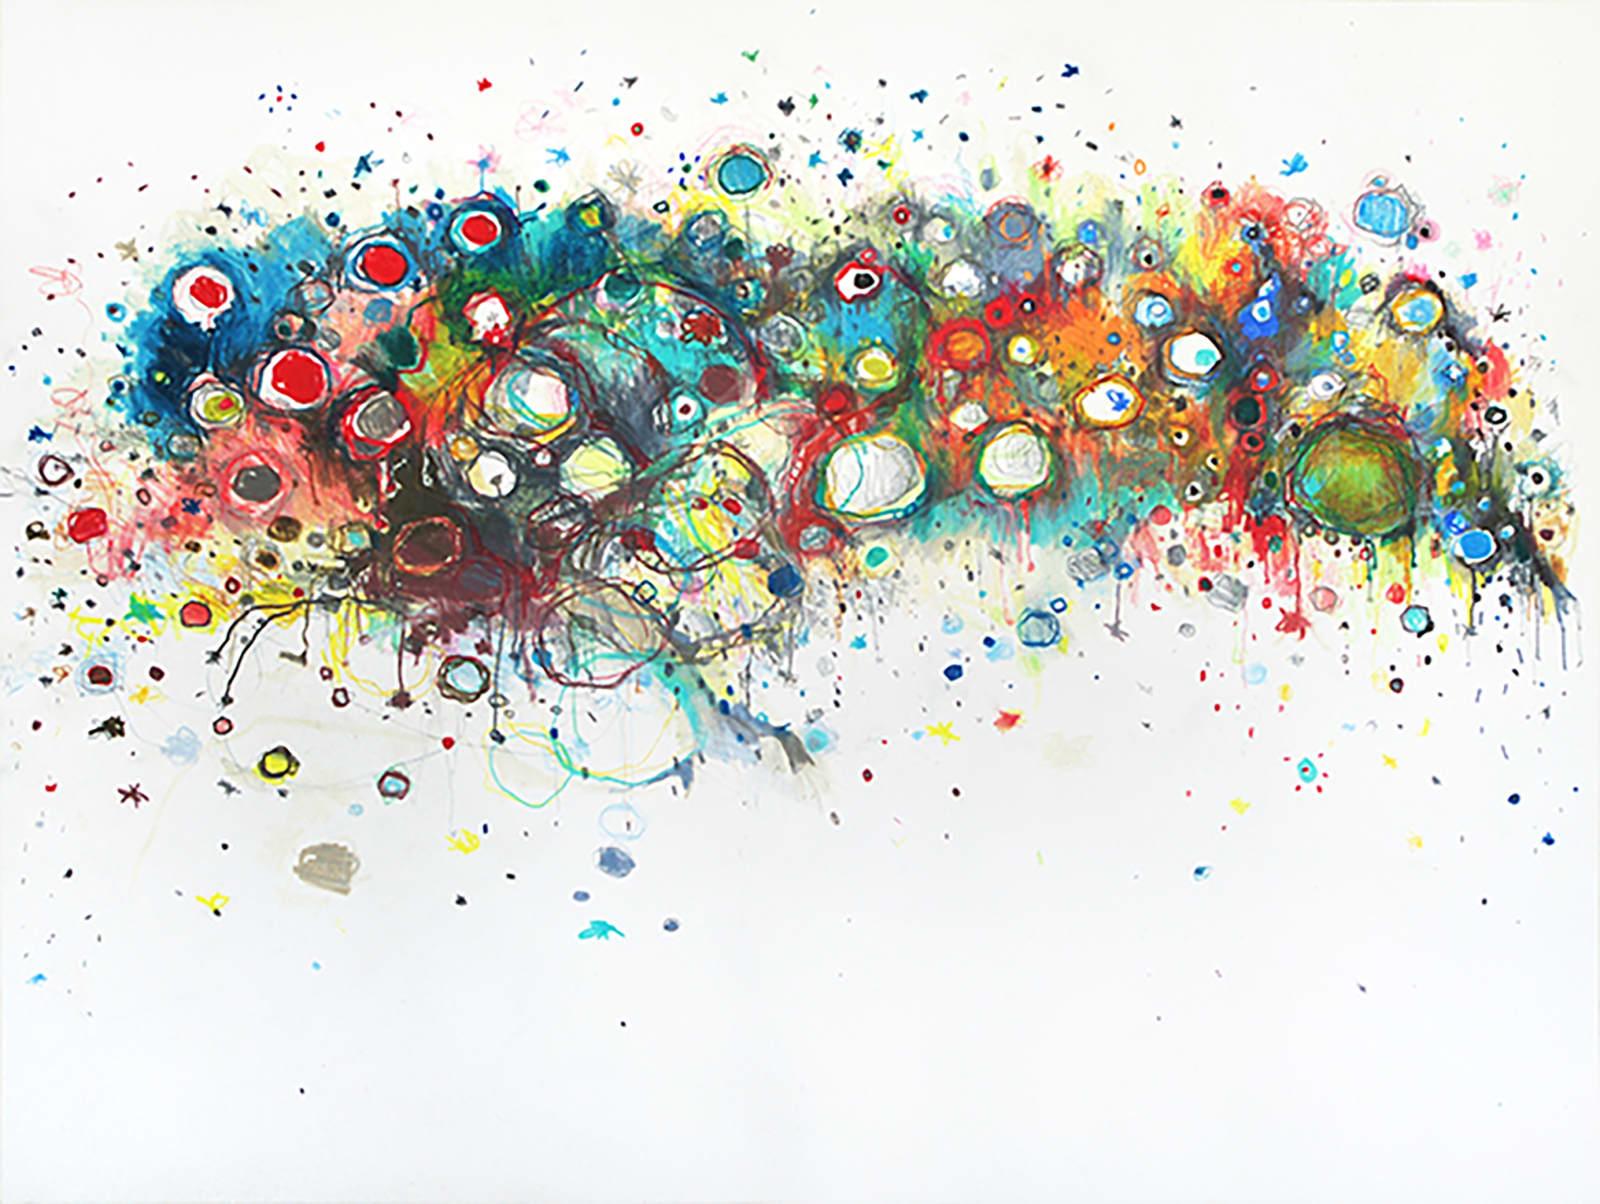 Clara Fialho. Untitled #283, 2015. Pencil on Paper. 12 × 16 in.